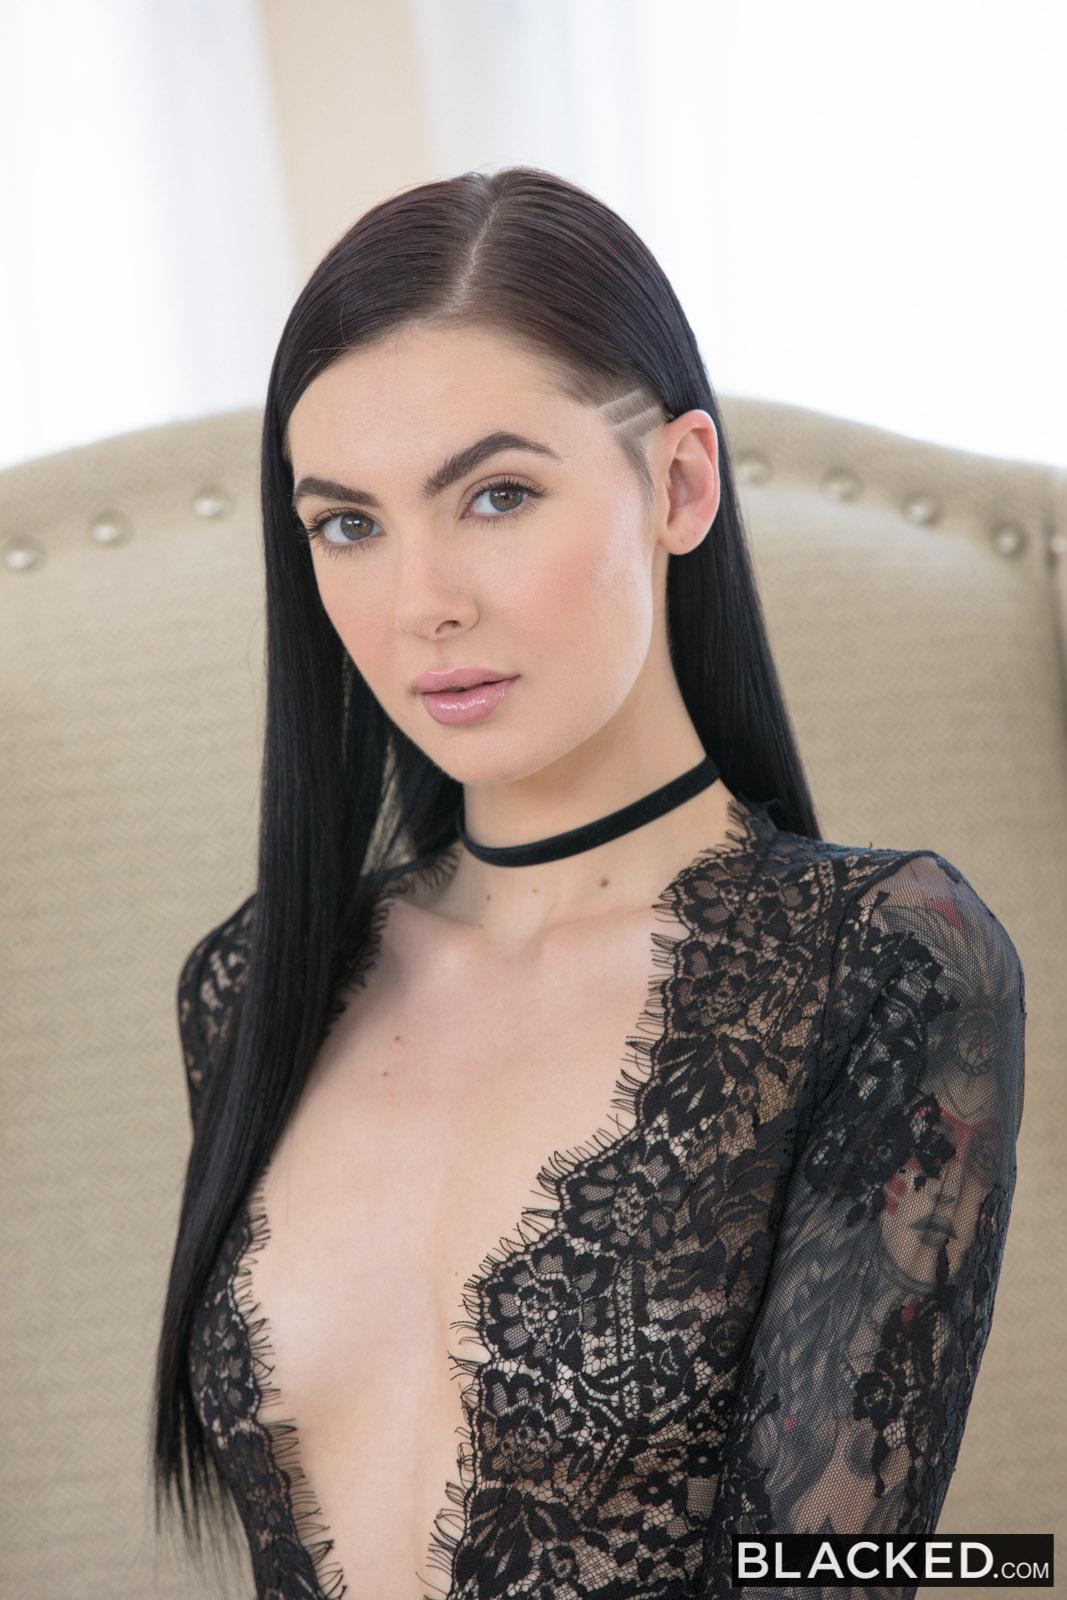 marley brinx anal